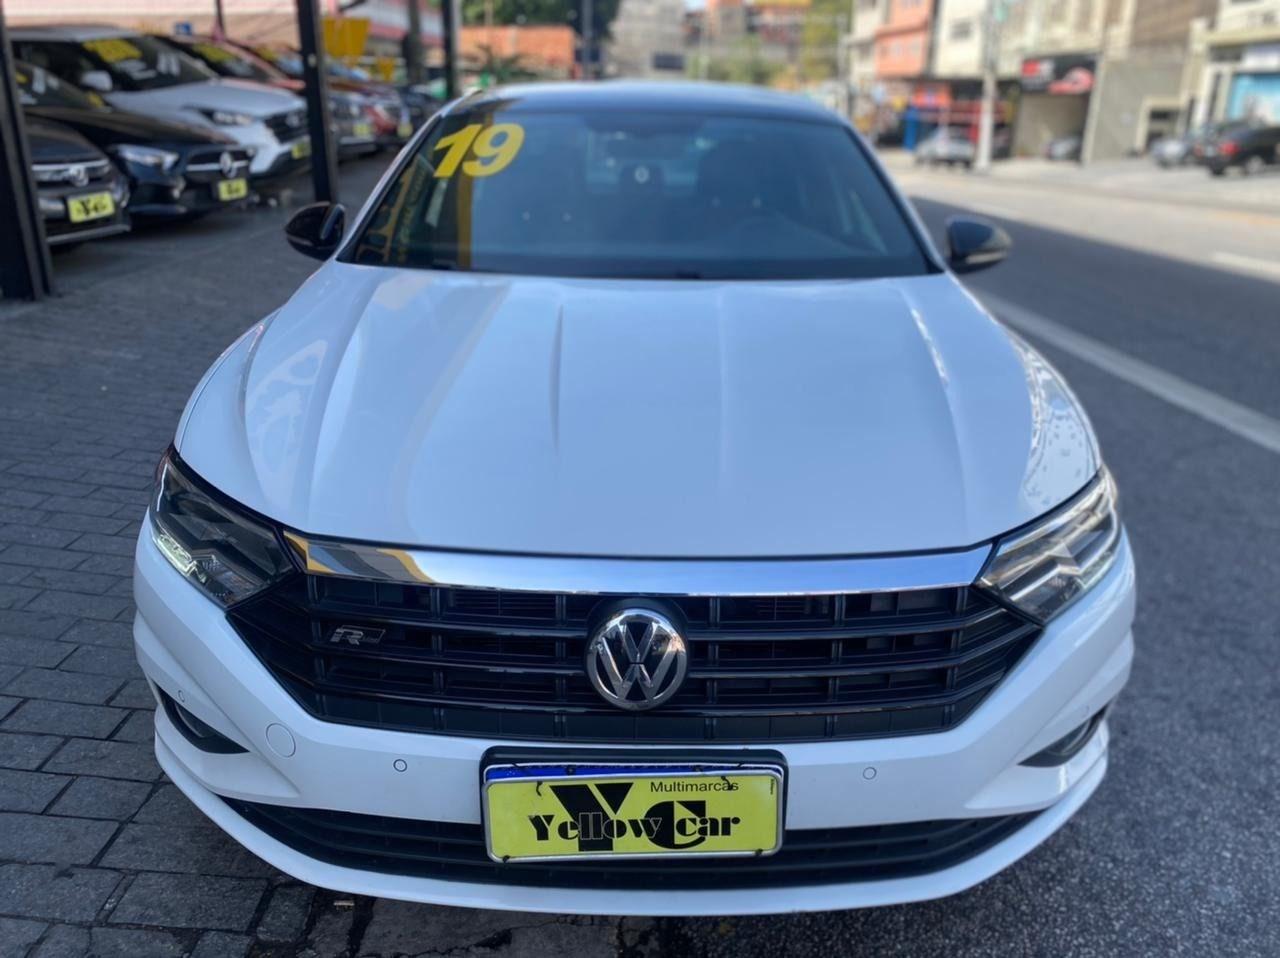 //www.autoline.com.br/carro/volkswagen/jetta-14-250-tsi-r-line-16v-flex-4p-turbo-tiptronic/2019/sao-paulo-sp/15171470